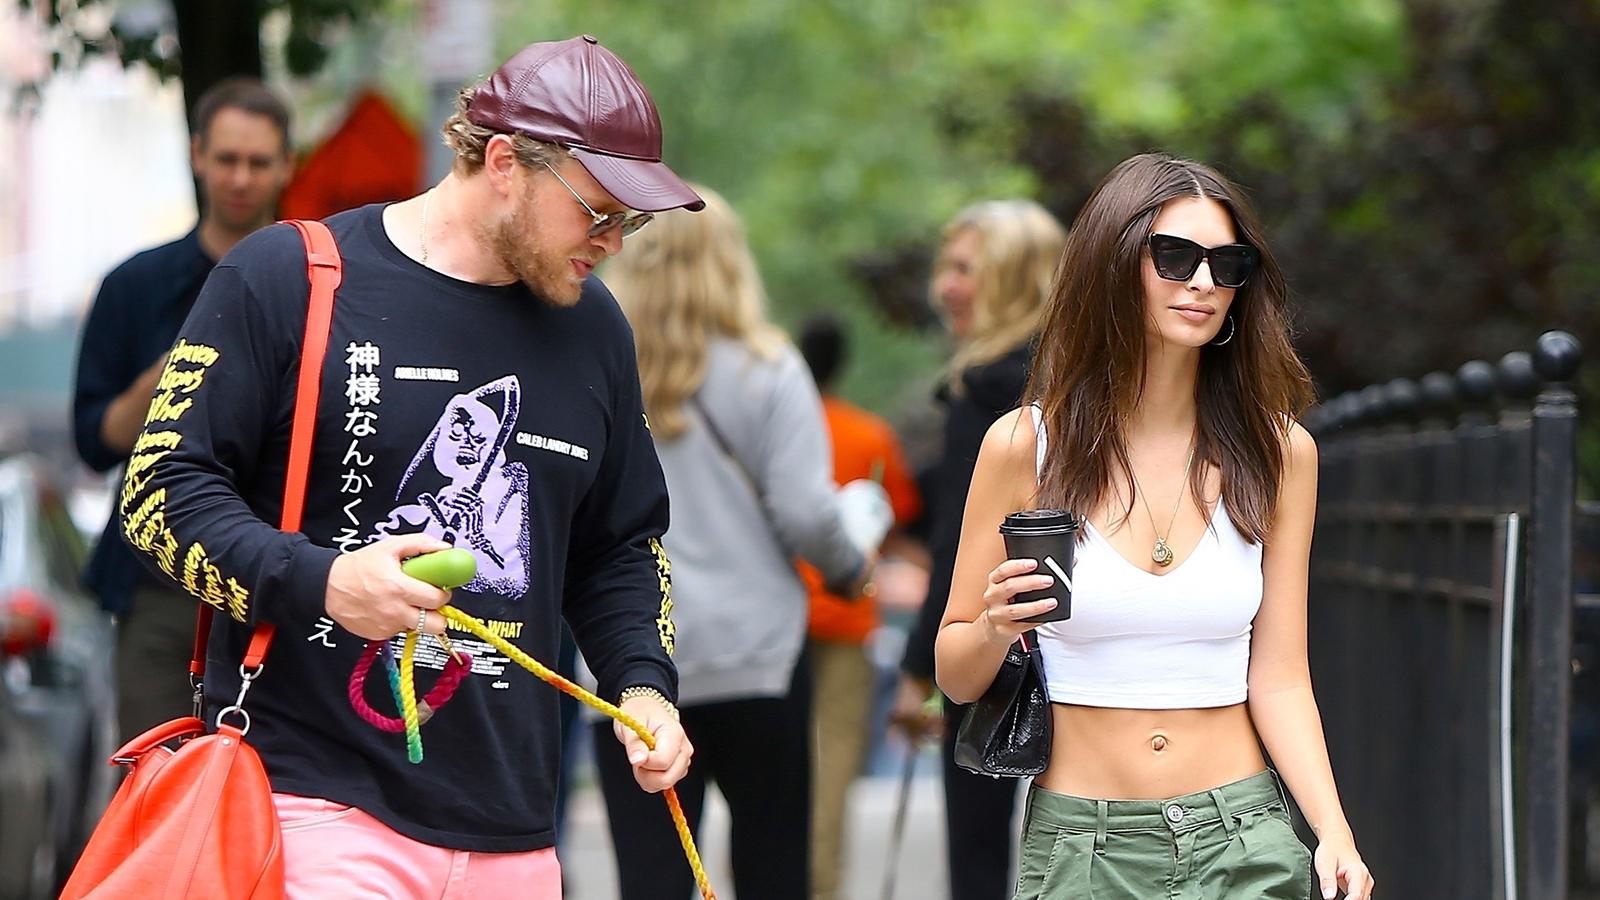 emily ratajkowski looks hot with her husband at the dog park